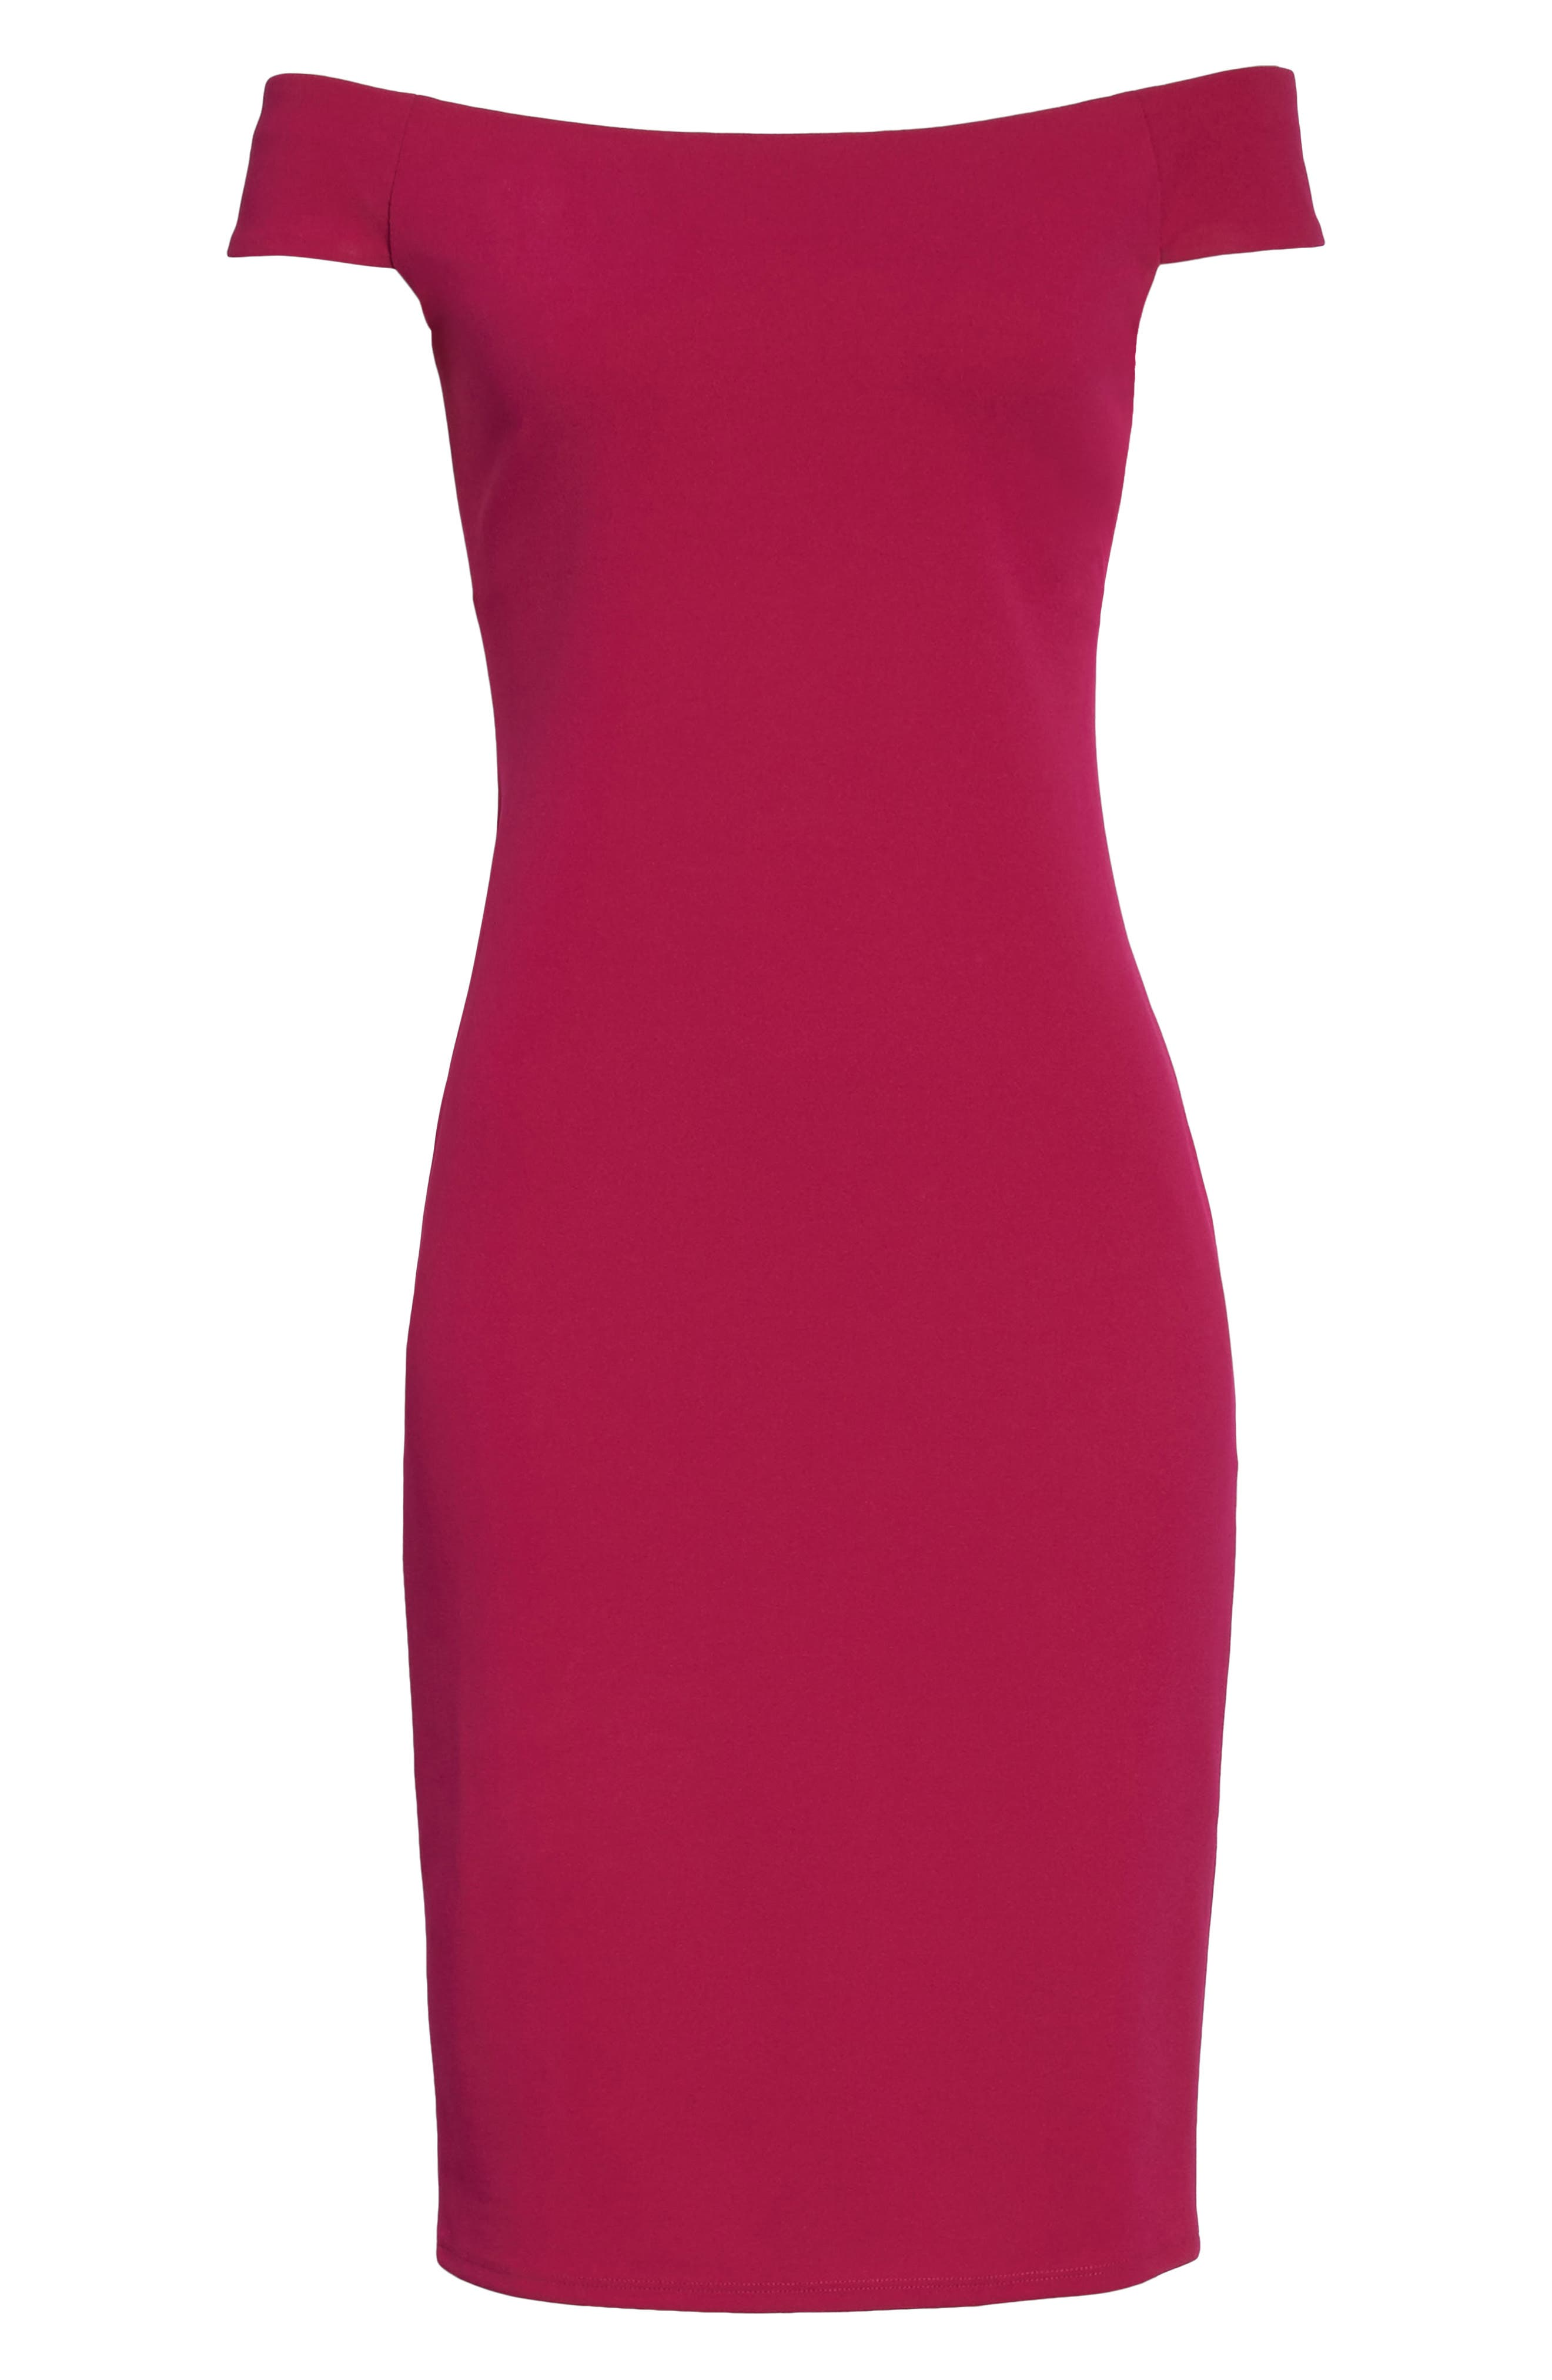 Off the Shoulder Sheath Dress,                             Alternate thumbnail 23, color,